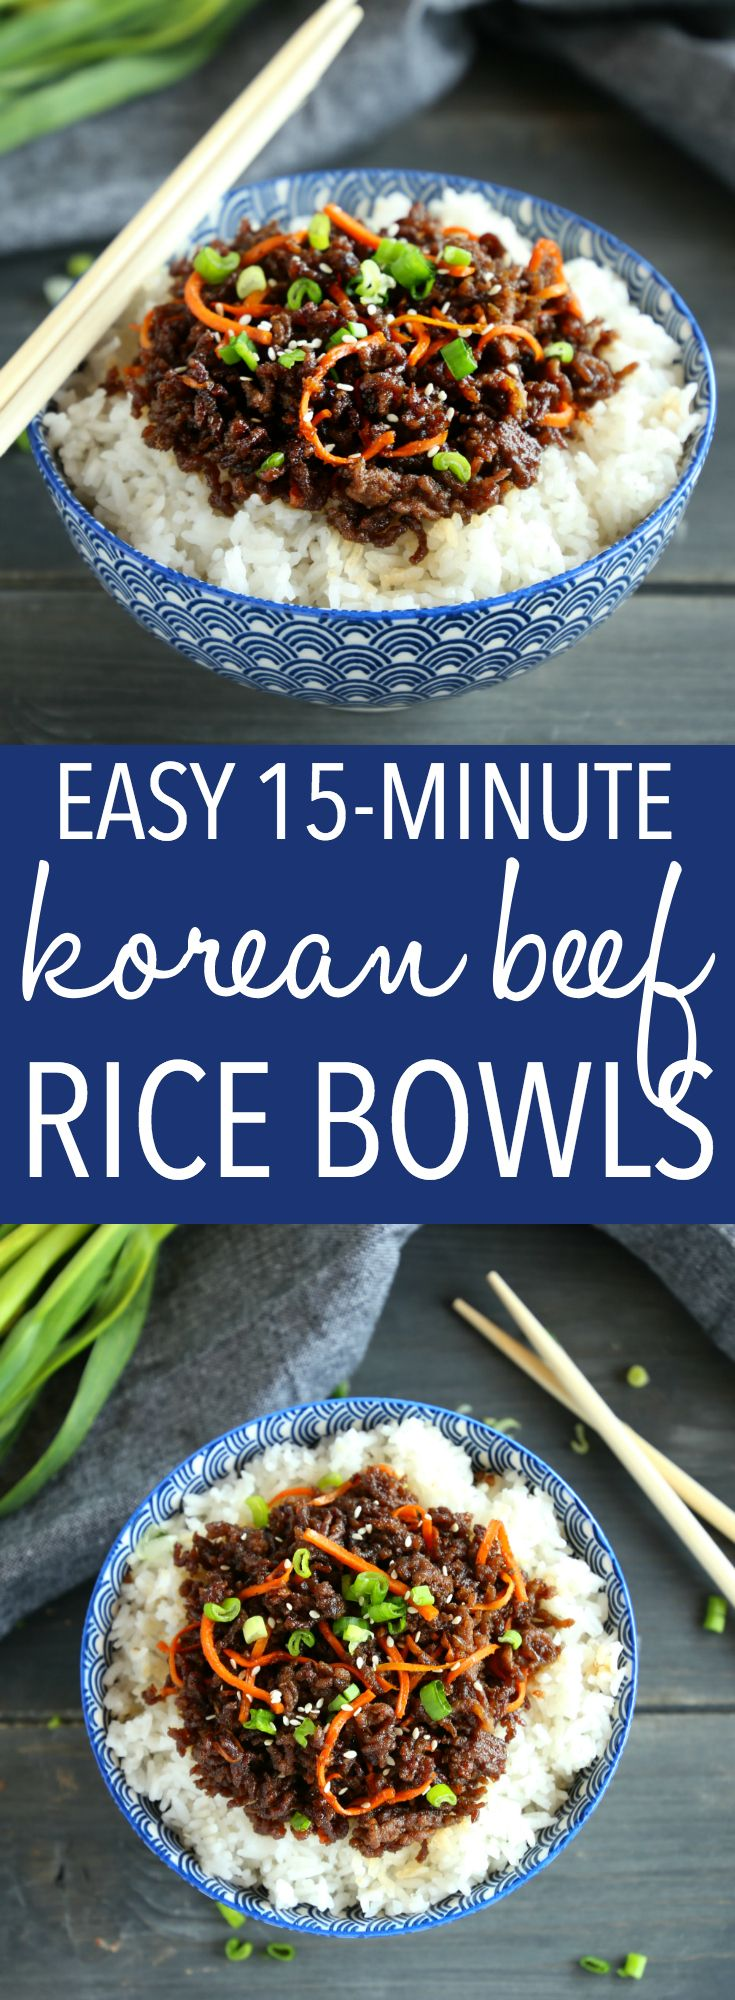 Easy Korean Beef Rice Bowls